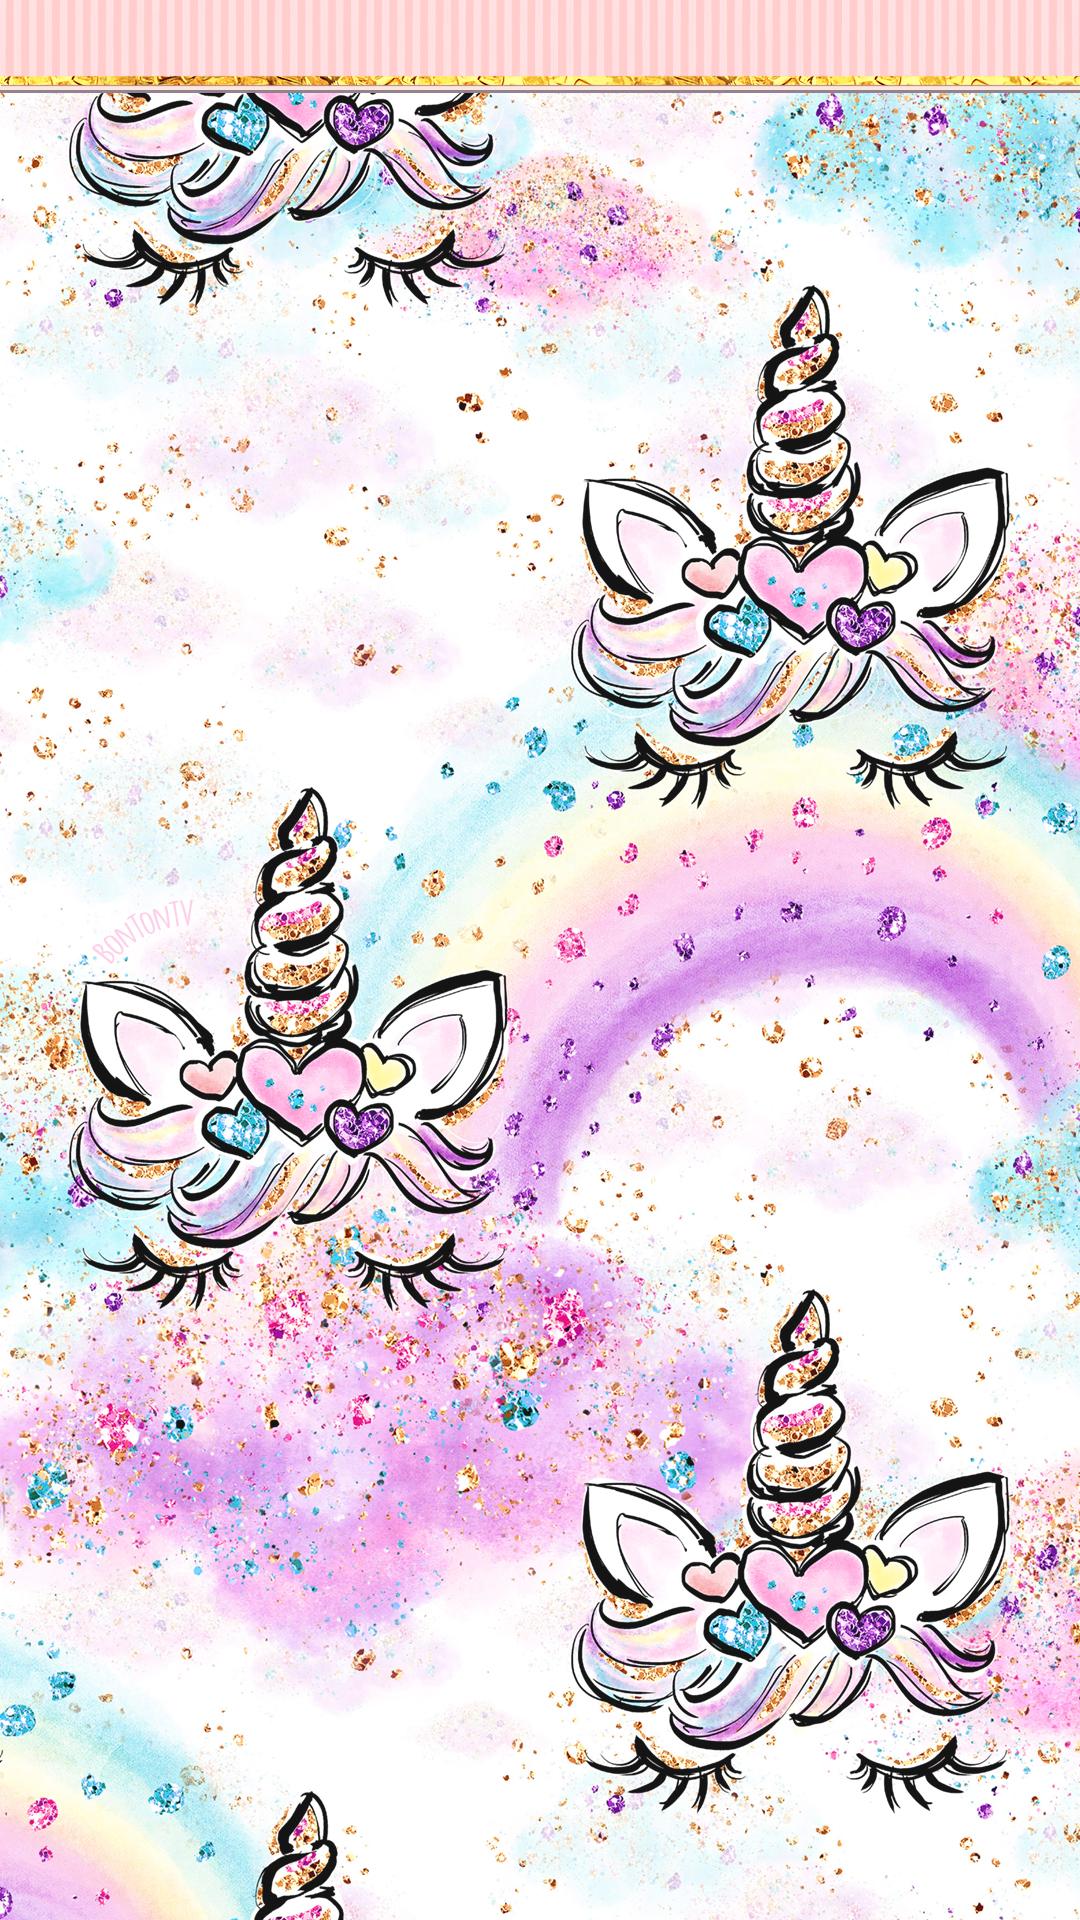 Phone Wallpapers Hd Cute Unicorn Glitter Art By Bonton Tv Free Backgrounds 1080x192 Iphone Wallpaper Unicorn Unicorn Wallpaper Cute Glitter Phone Wallpaper